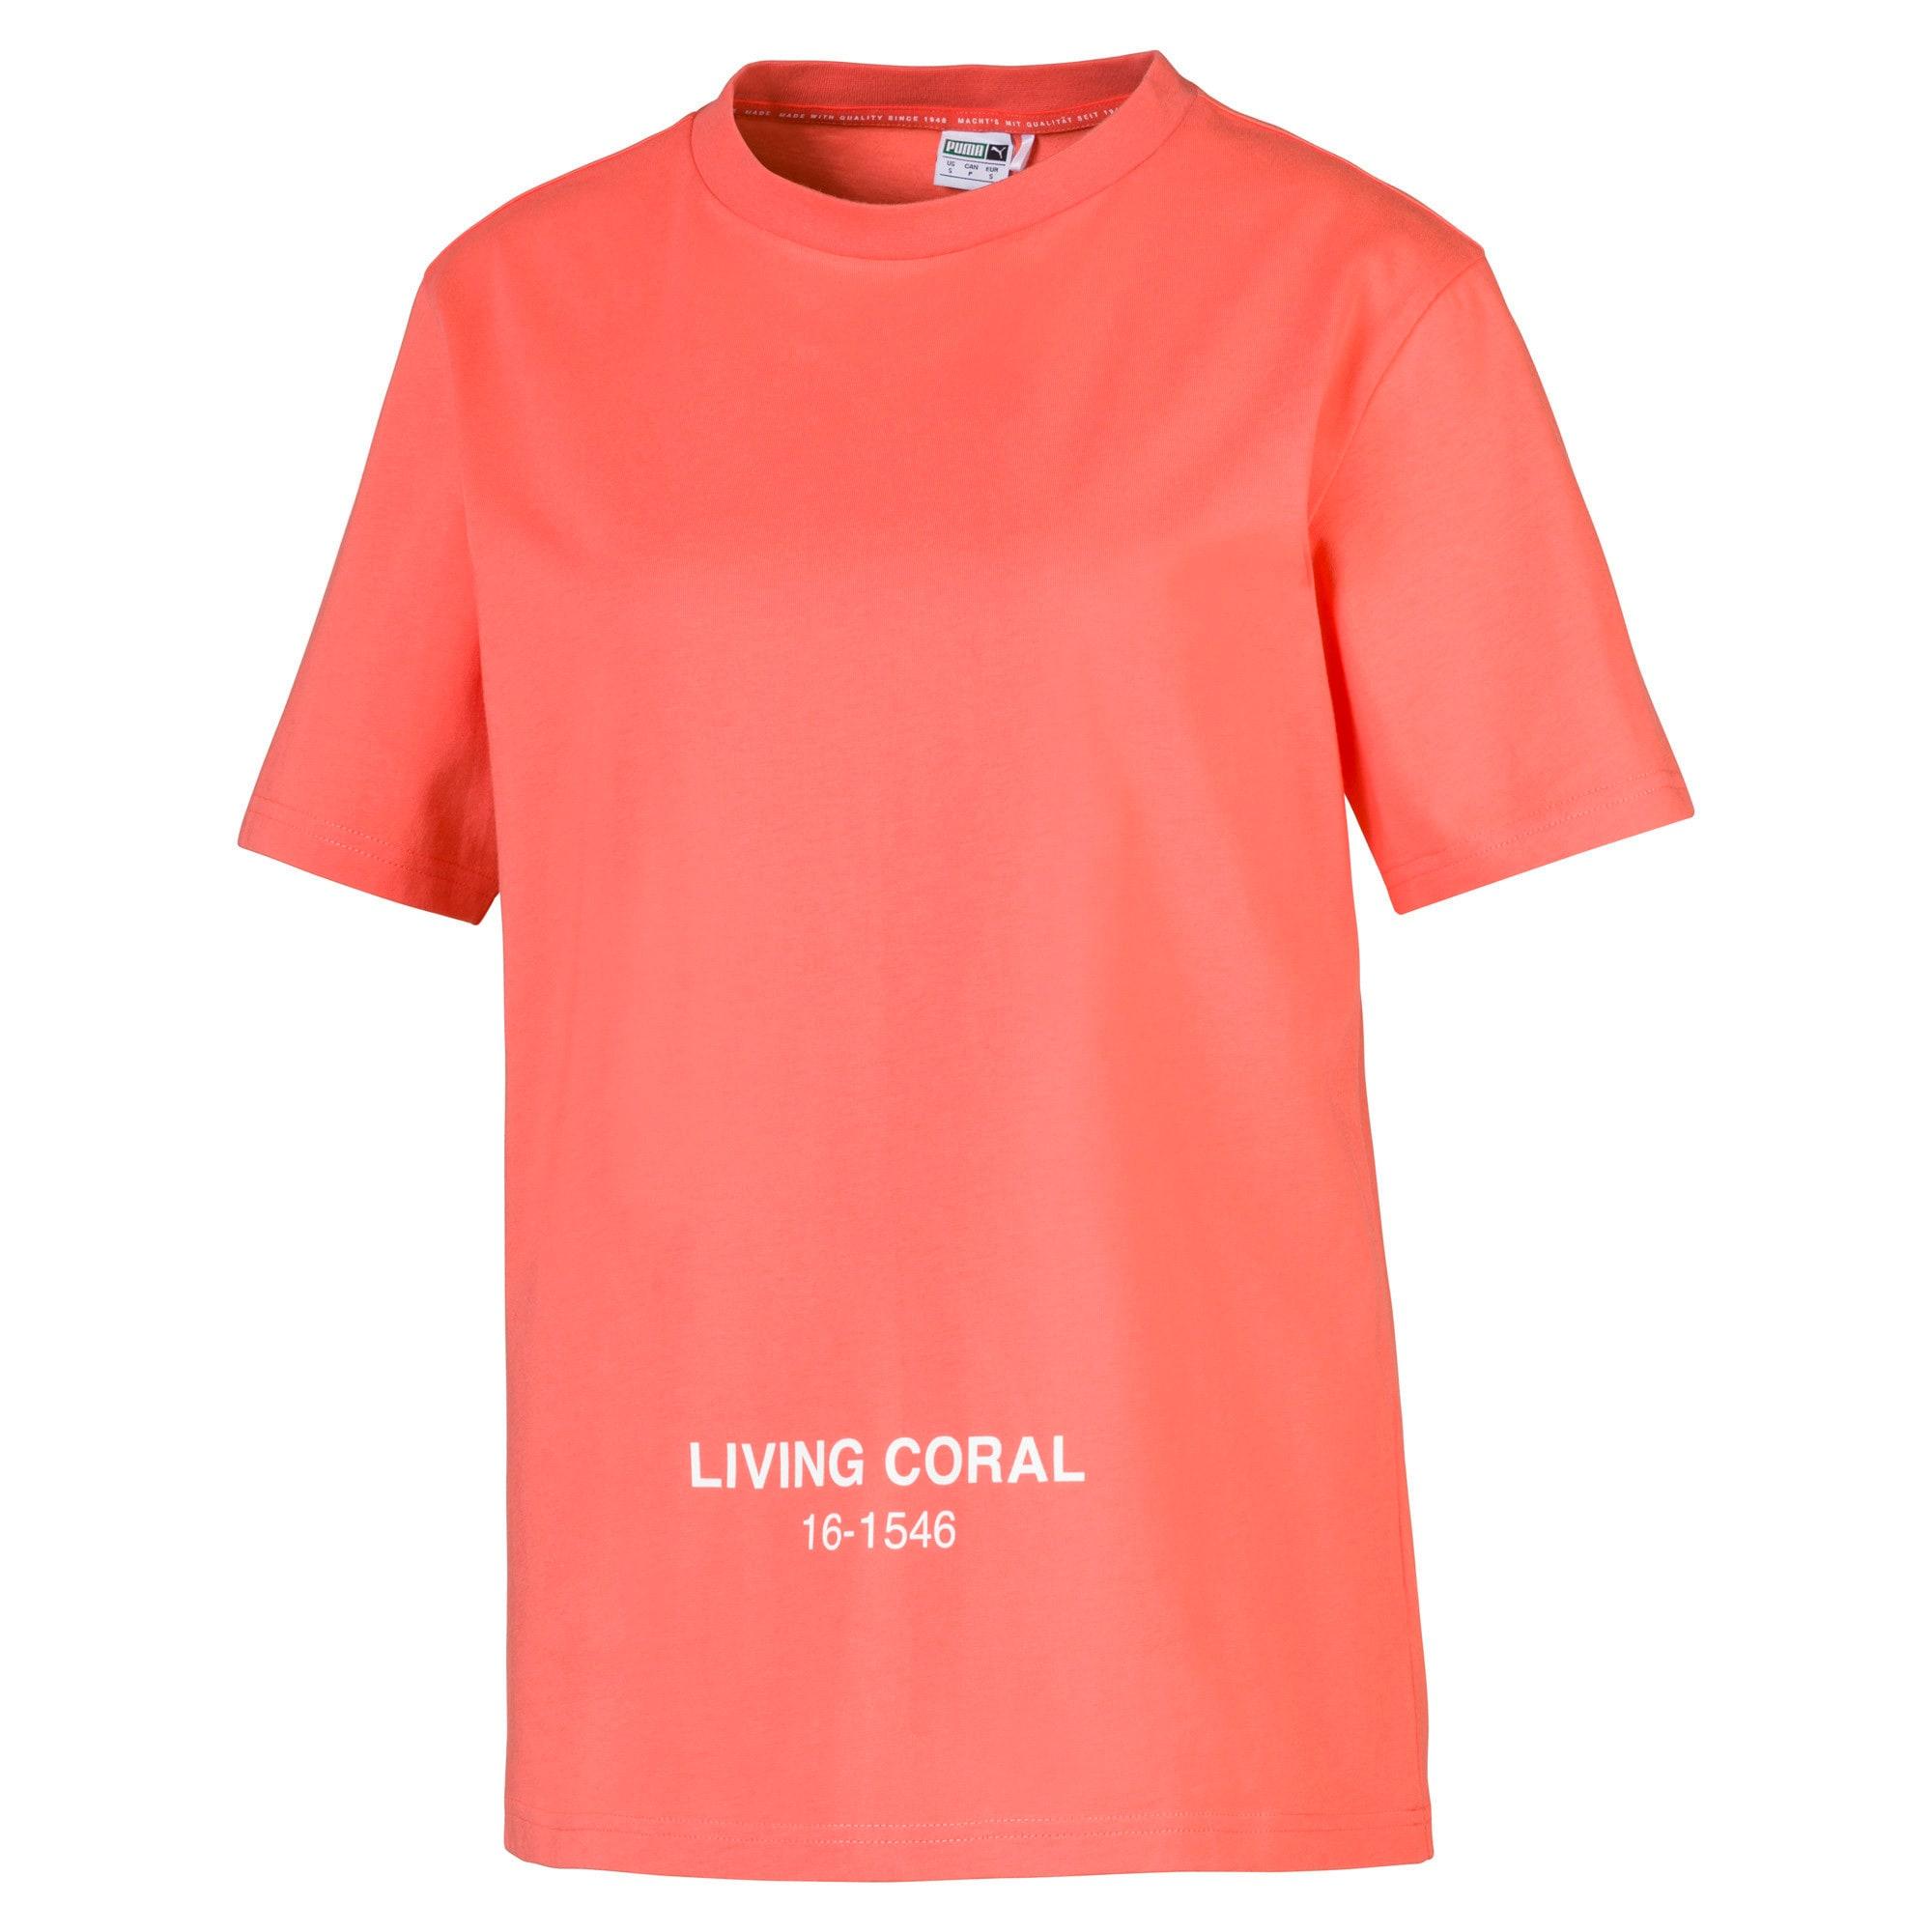 Thumbnail 1 of PUMA x PANTONE Tee, Transparent-Living Coral, medium